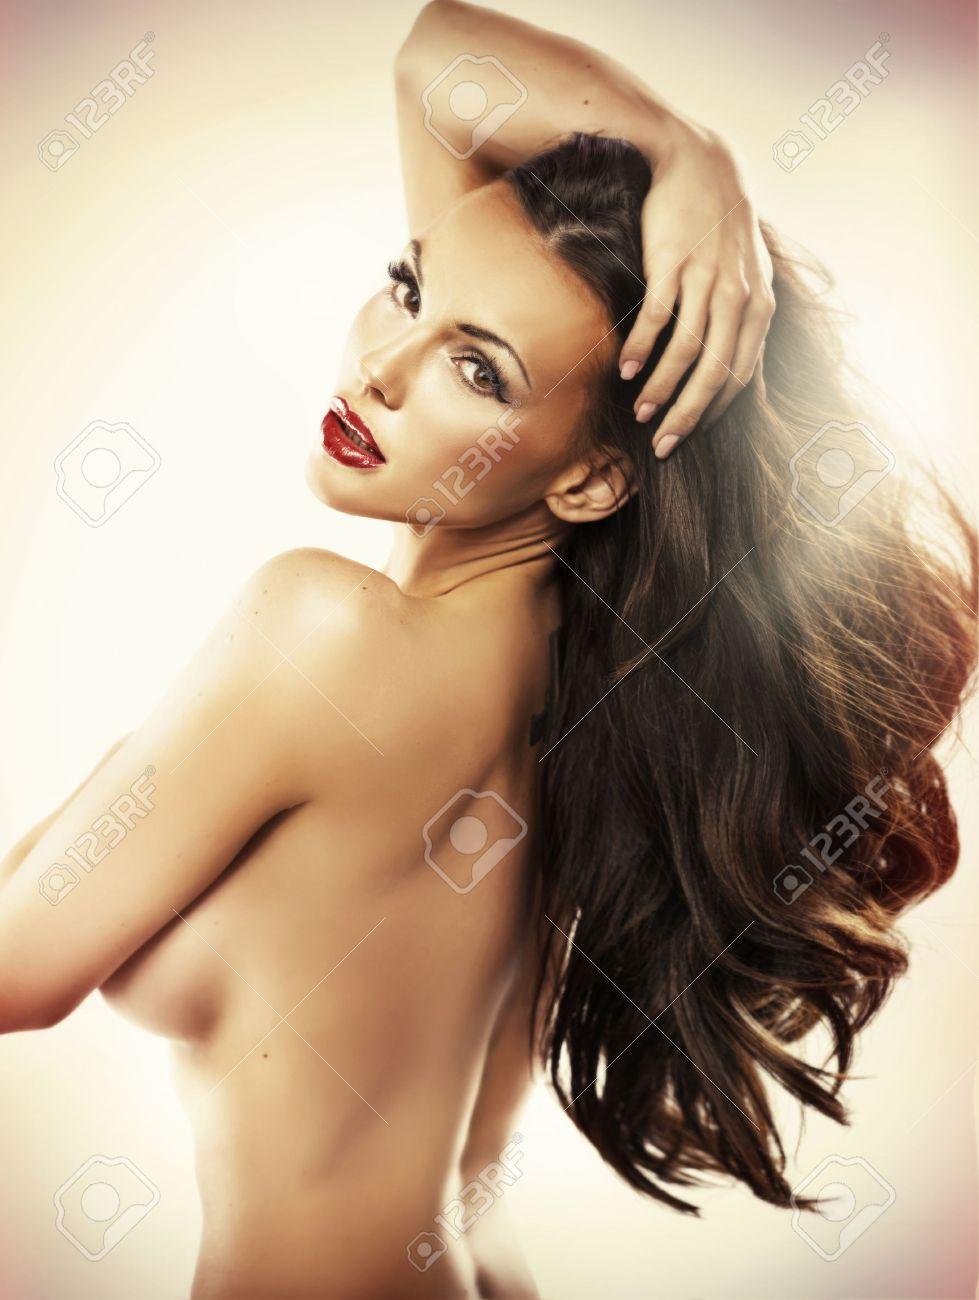 Nude schöne frauen Frauen Pics